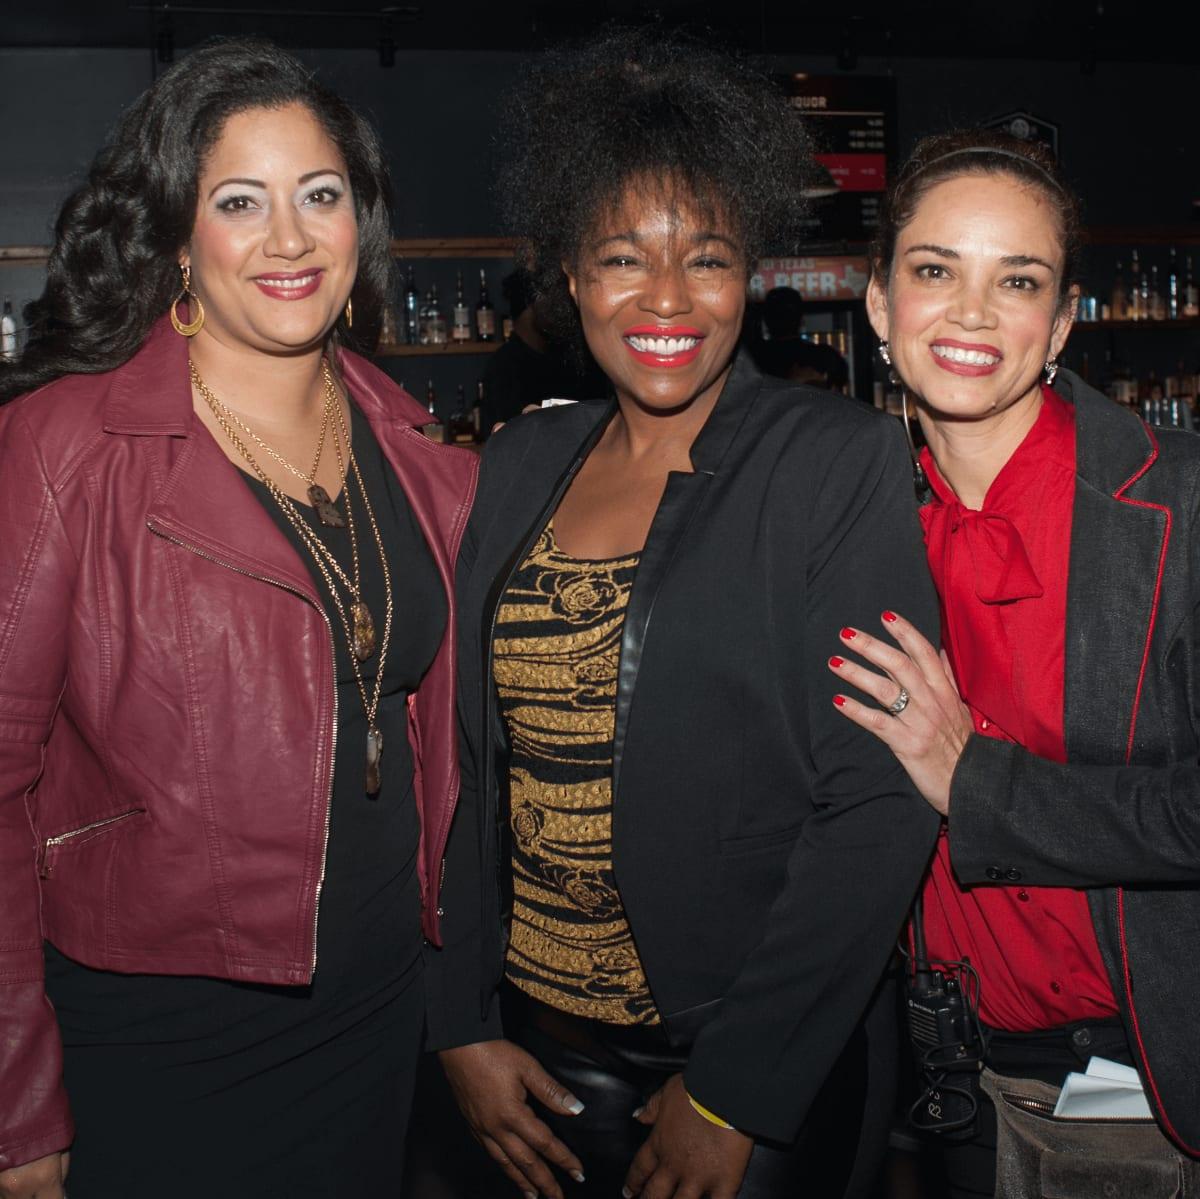 Sims Foundation Heart of the City 2016 Lauren Cervantes Angela Miller Celeste Quesada